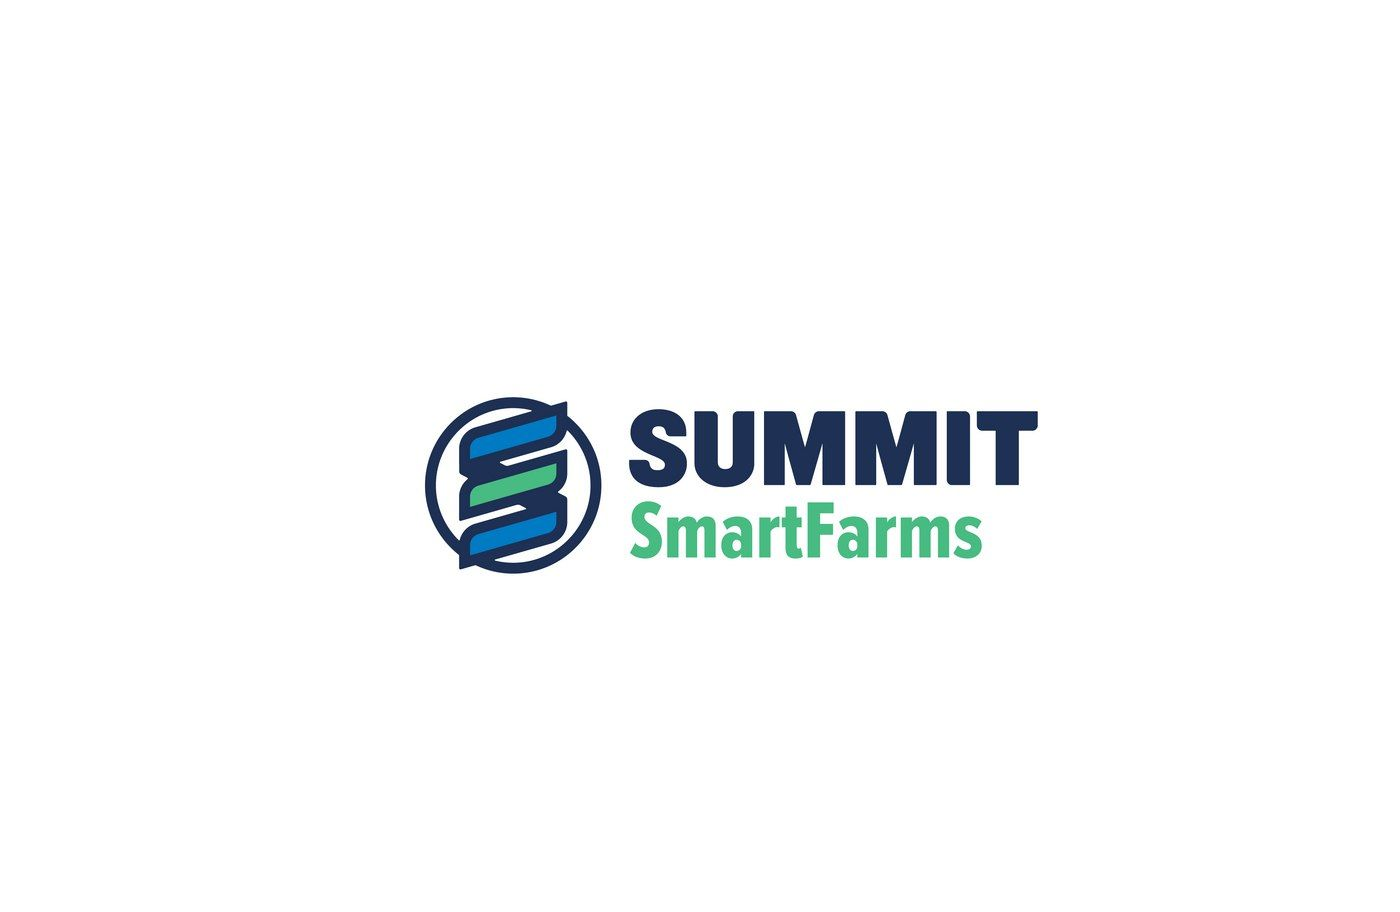 Summit_About Us_Summit SmartFarms-01